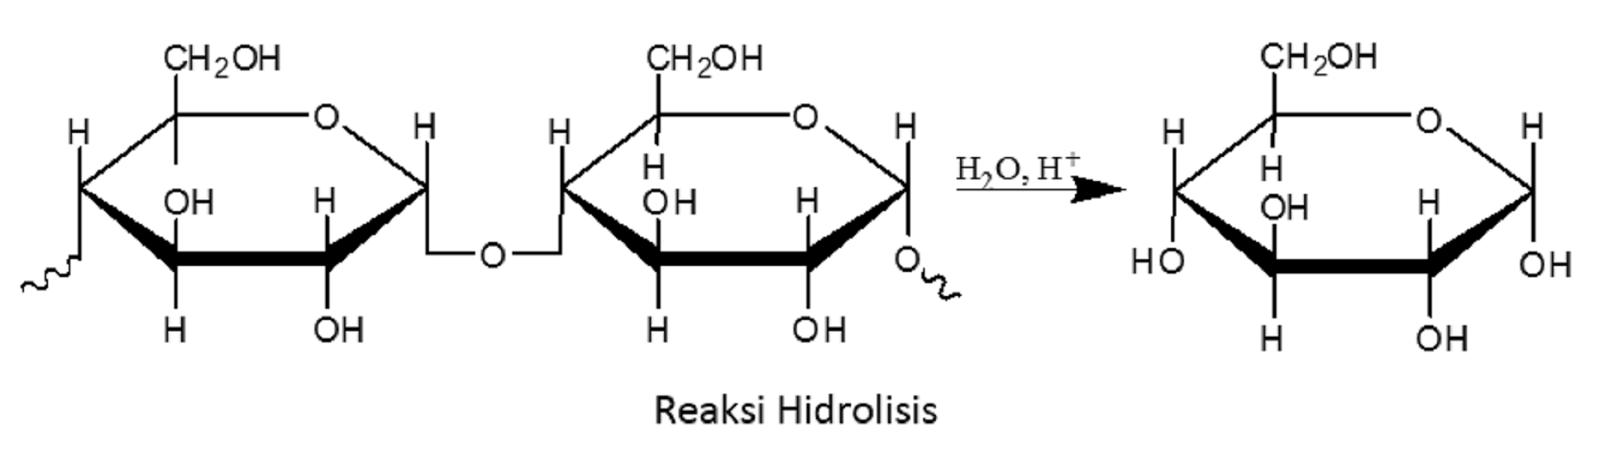 hidrolisis karbohidrat ebook